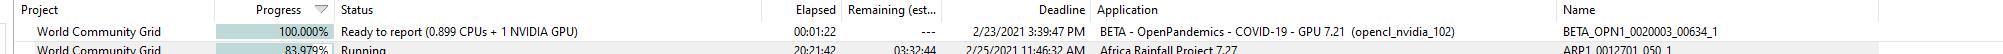 https://tweakers.net/i/tA1yO-bgBQj_AYGDp0zEwk9Lpo0=/full-fit-in/4000x4000/filters:no_upscale():fill(white):strip_exif()/f/image/PRMQK1gg47escPFxxH4paRaB.png?f=user_large